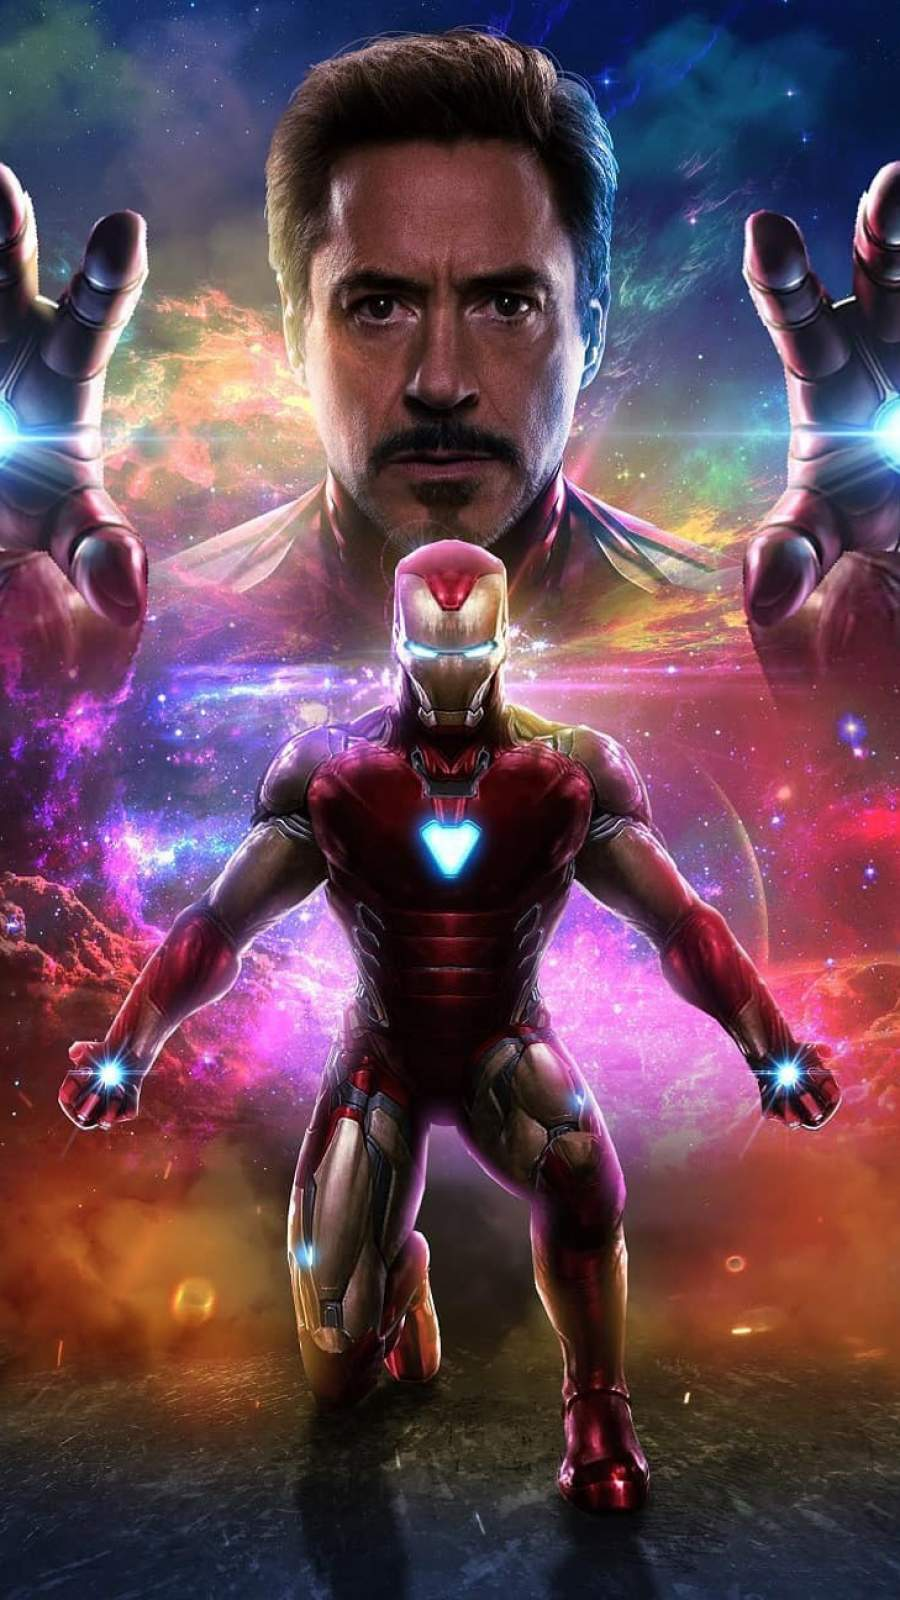 Iron Man Art iPhone Wallpaper 1